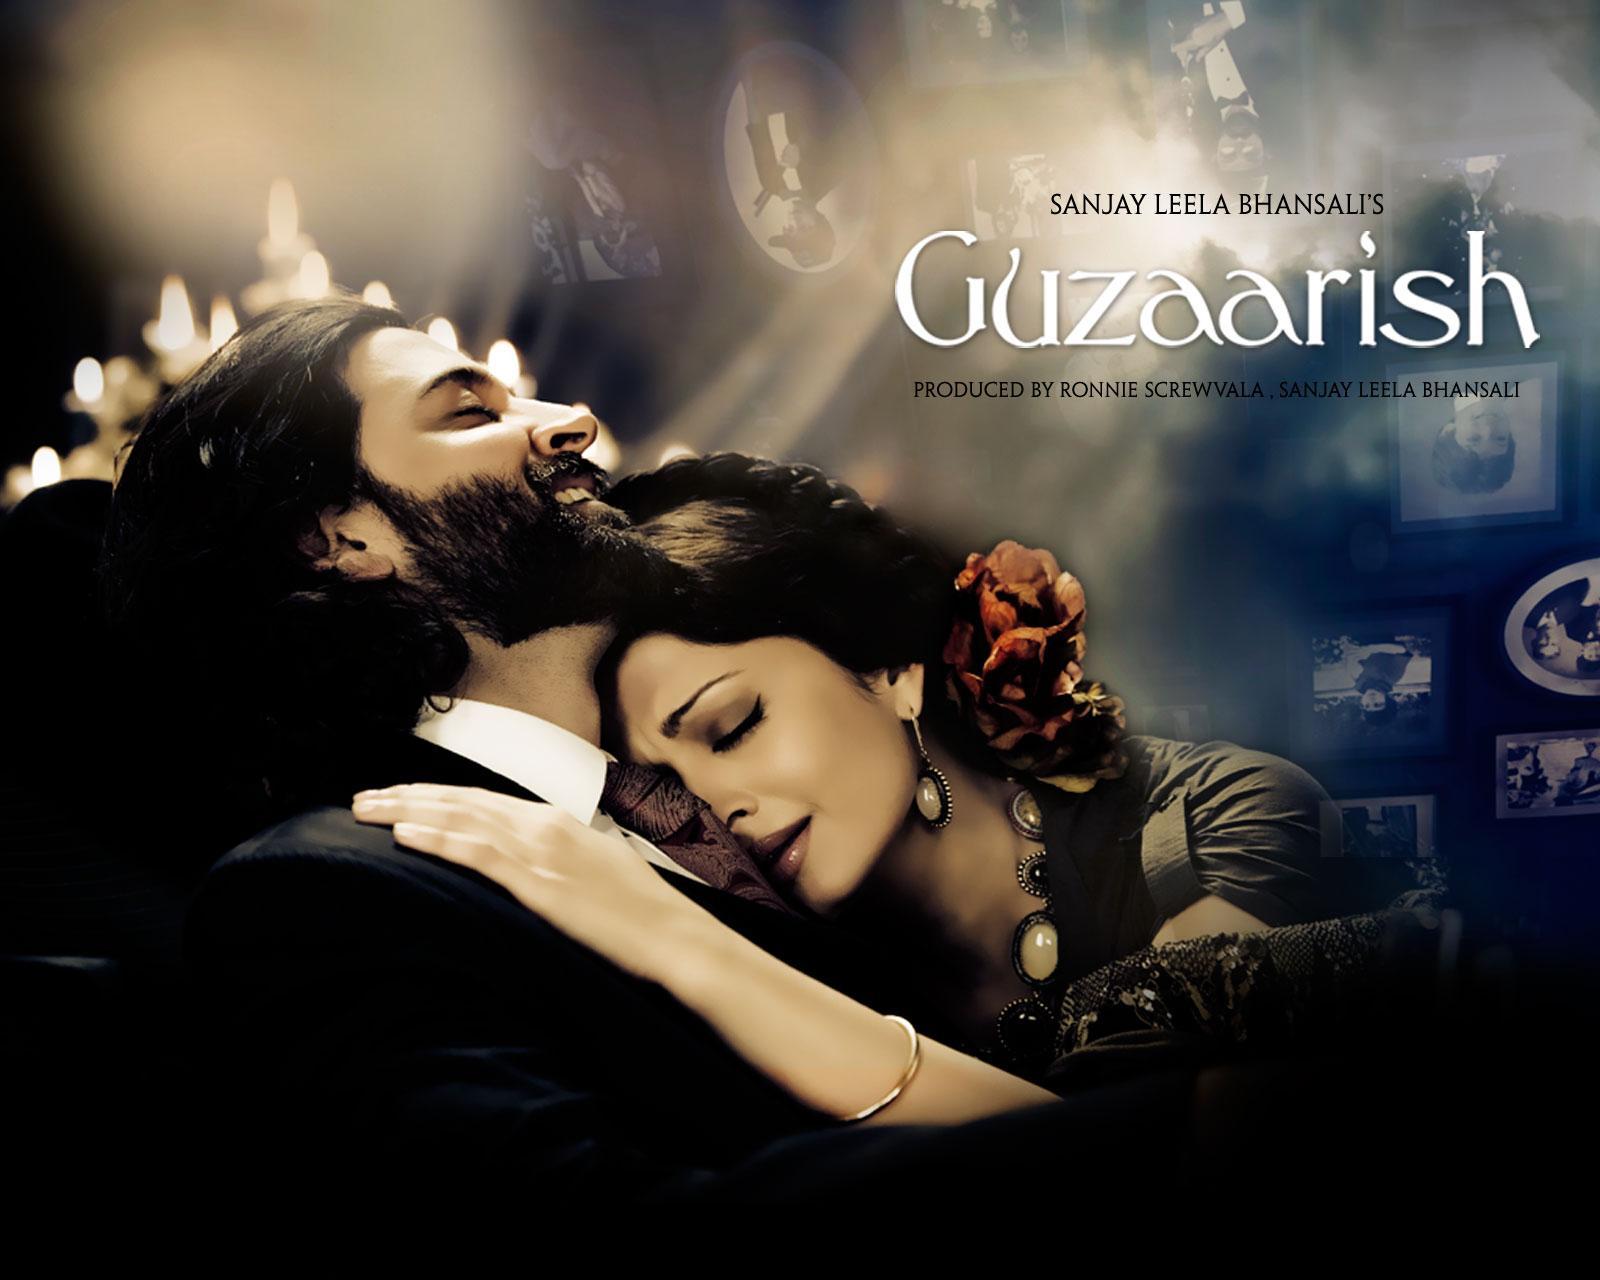 GuzarishHrithik vs Aishwarya